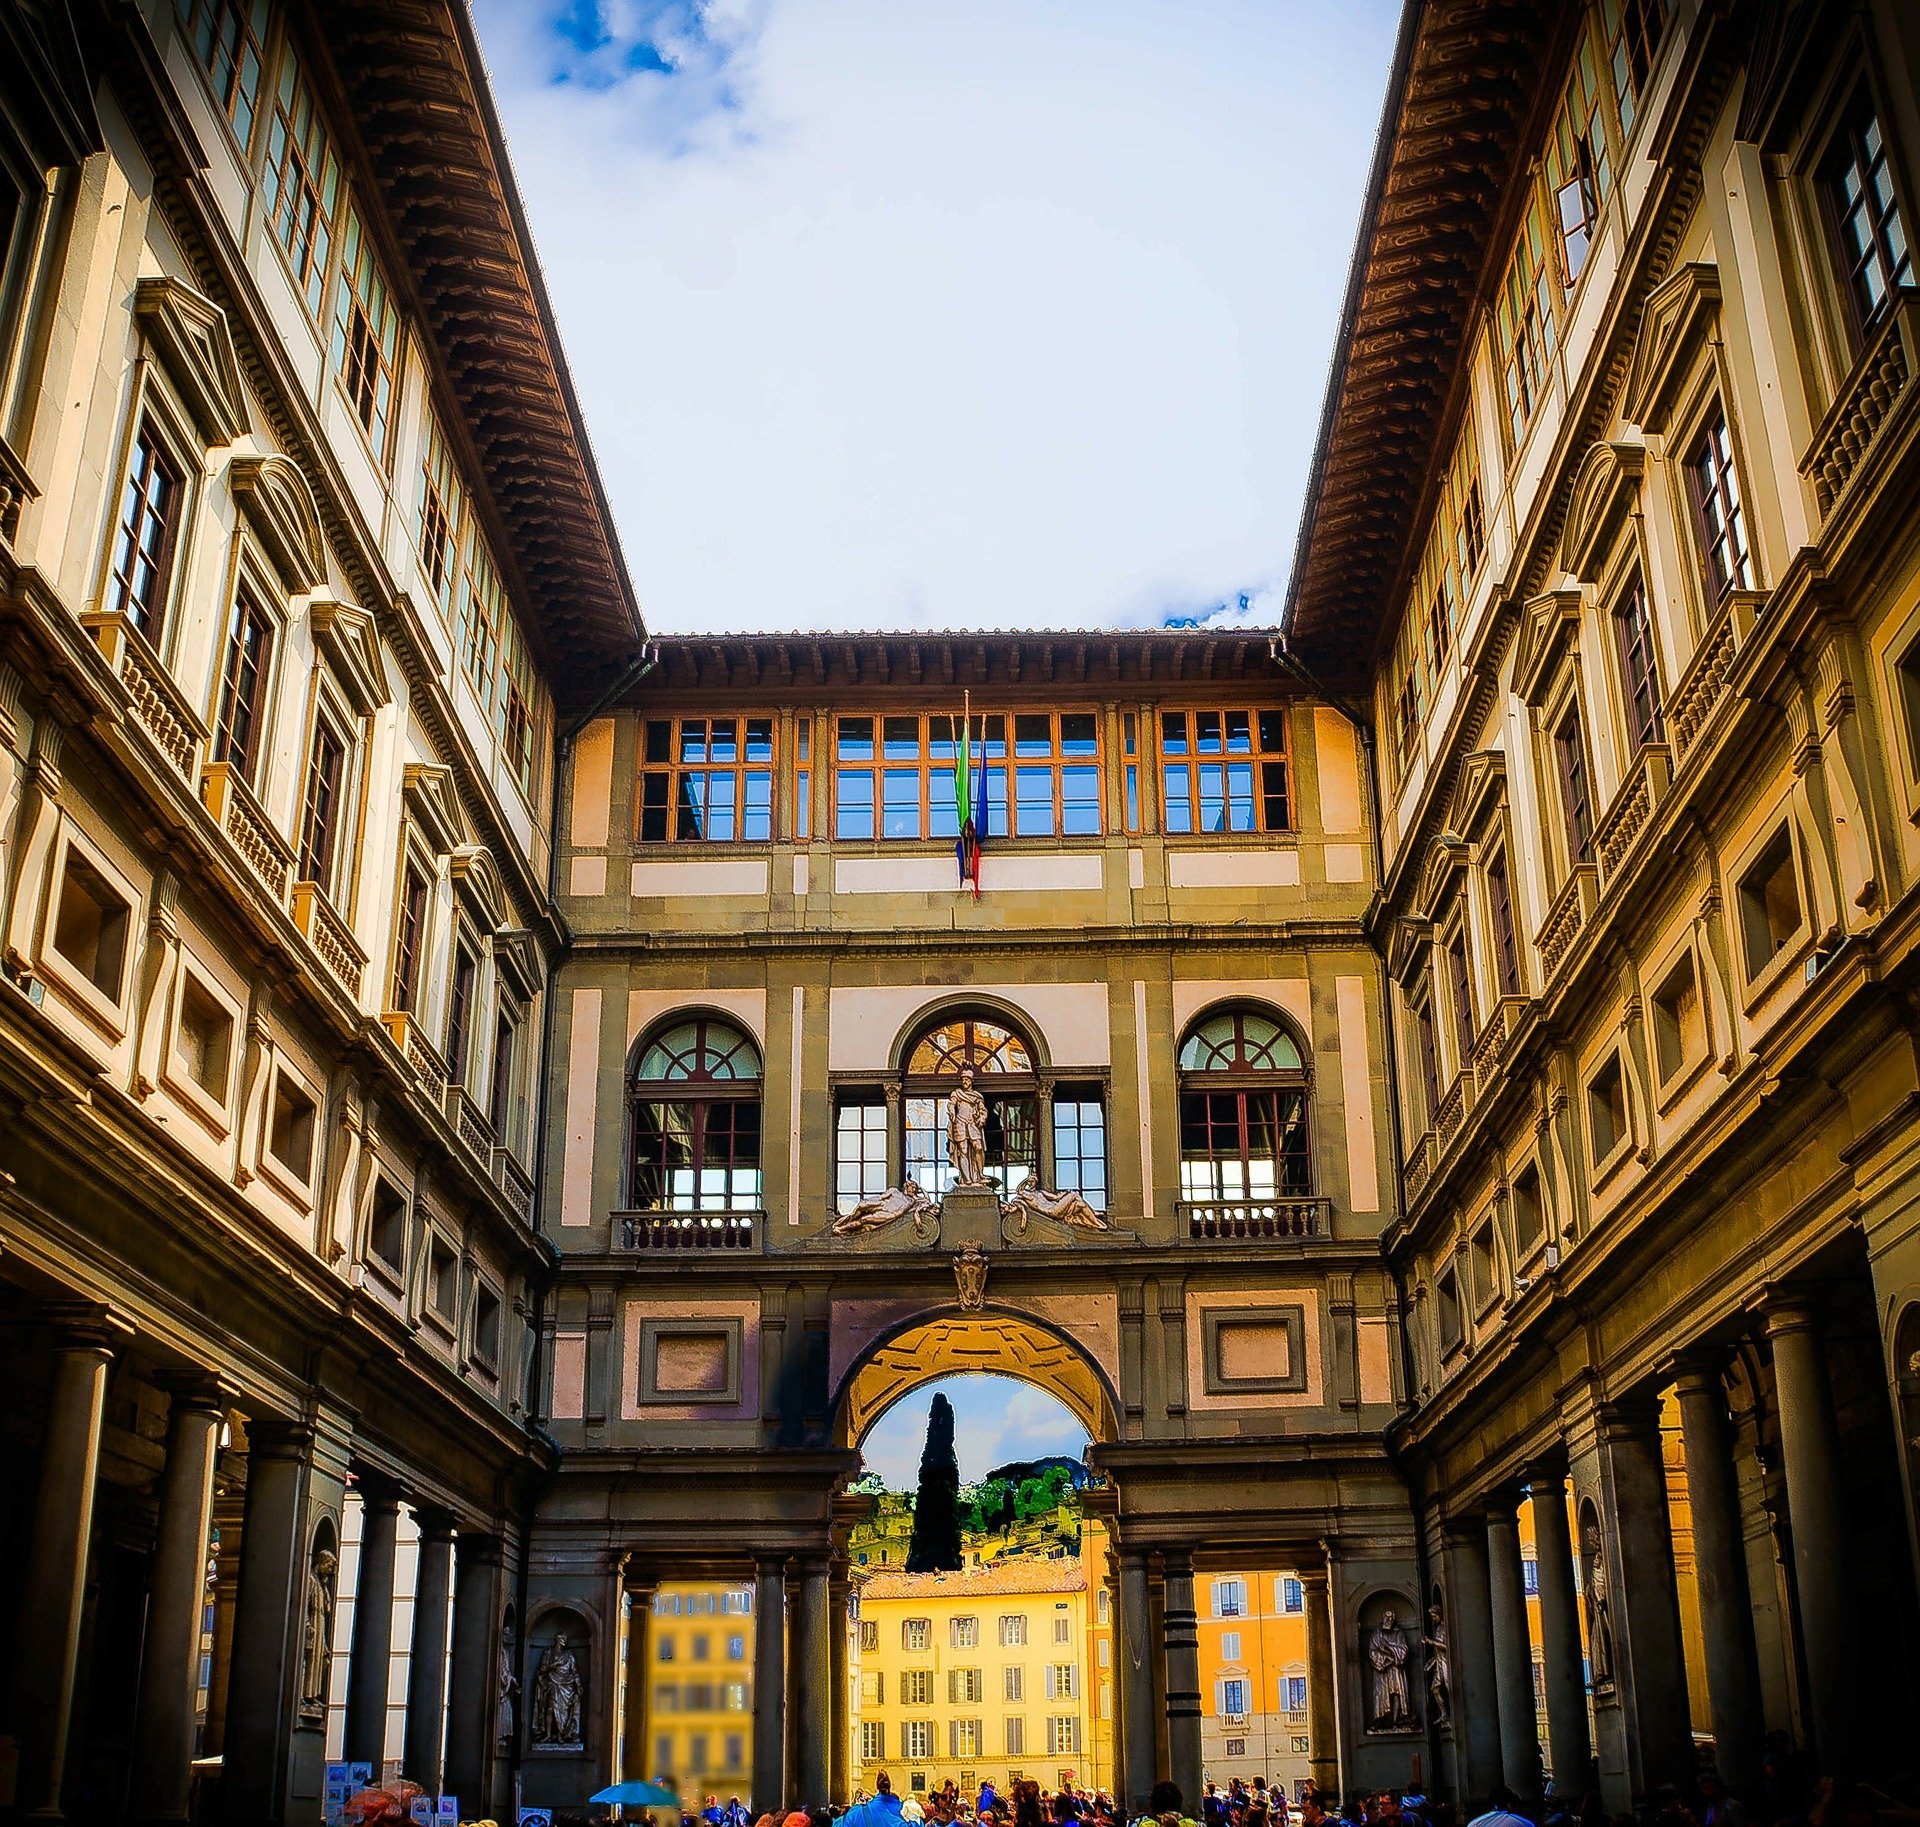 Uffizi Gallery Private Guided Tour